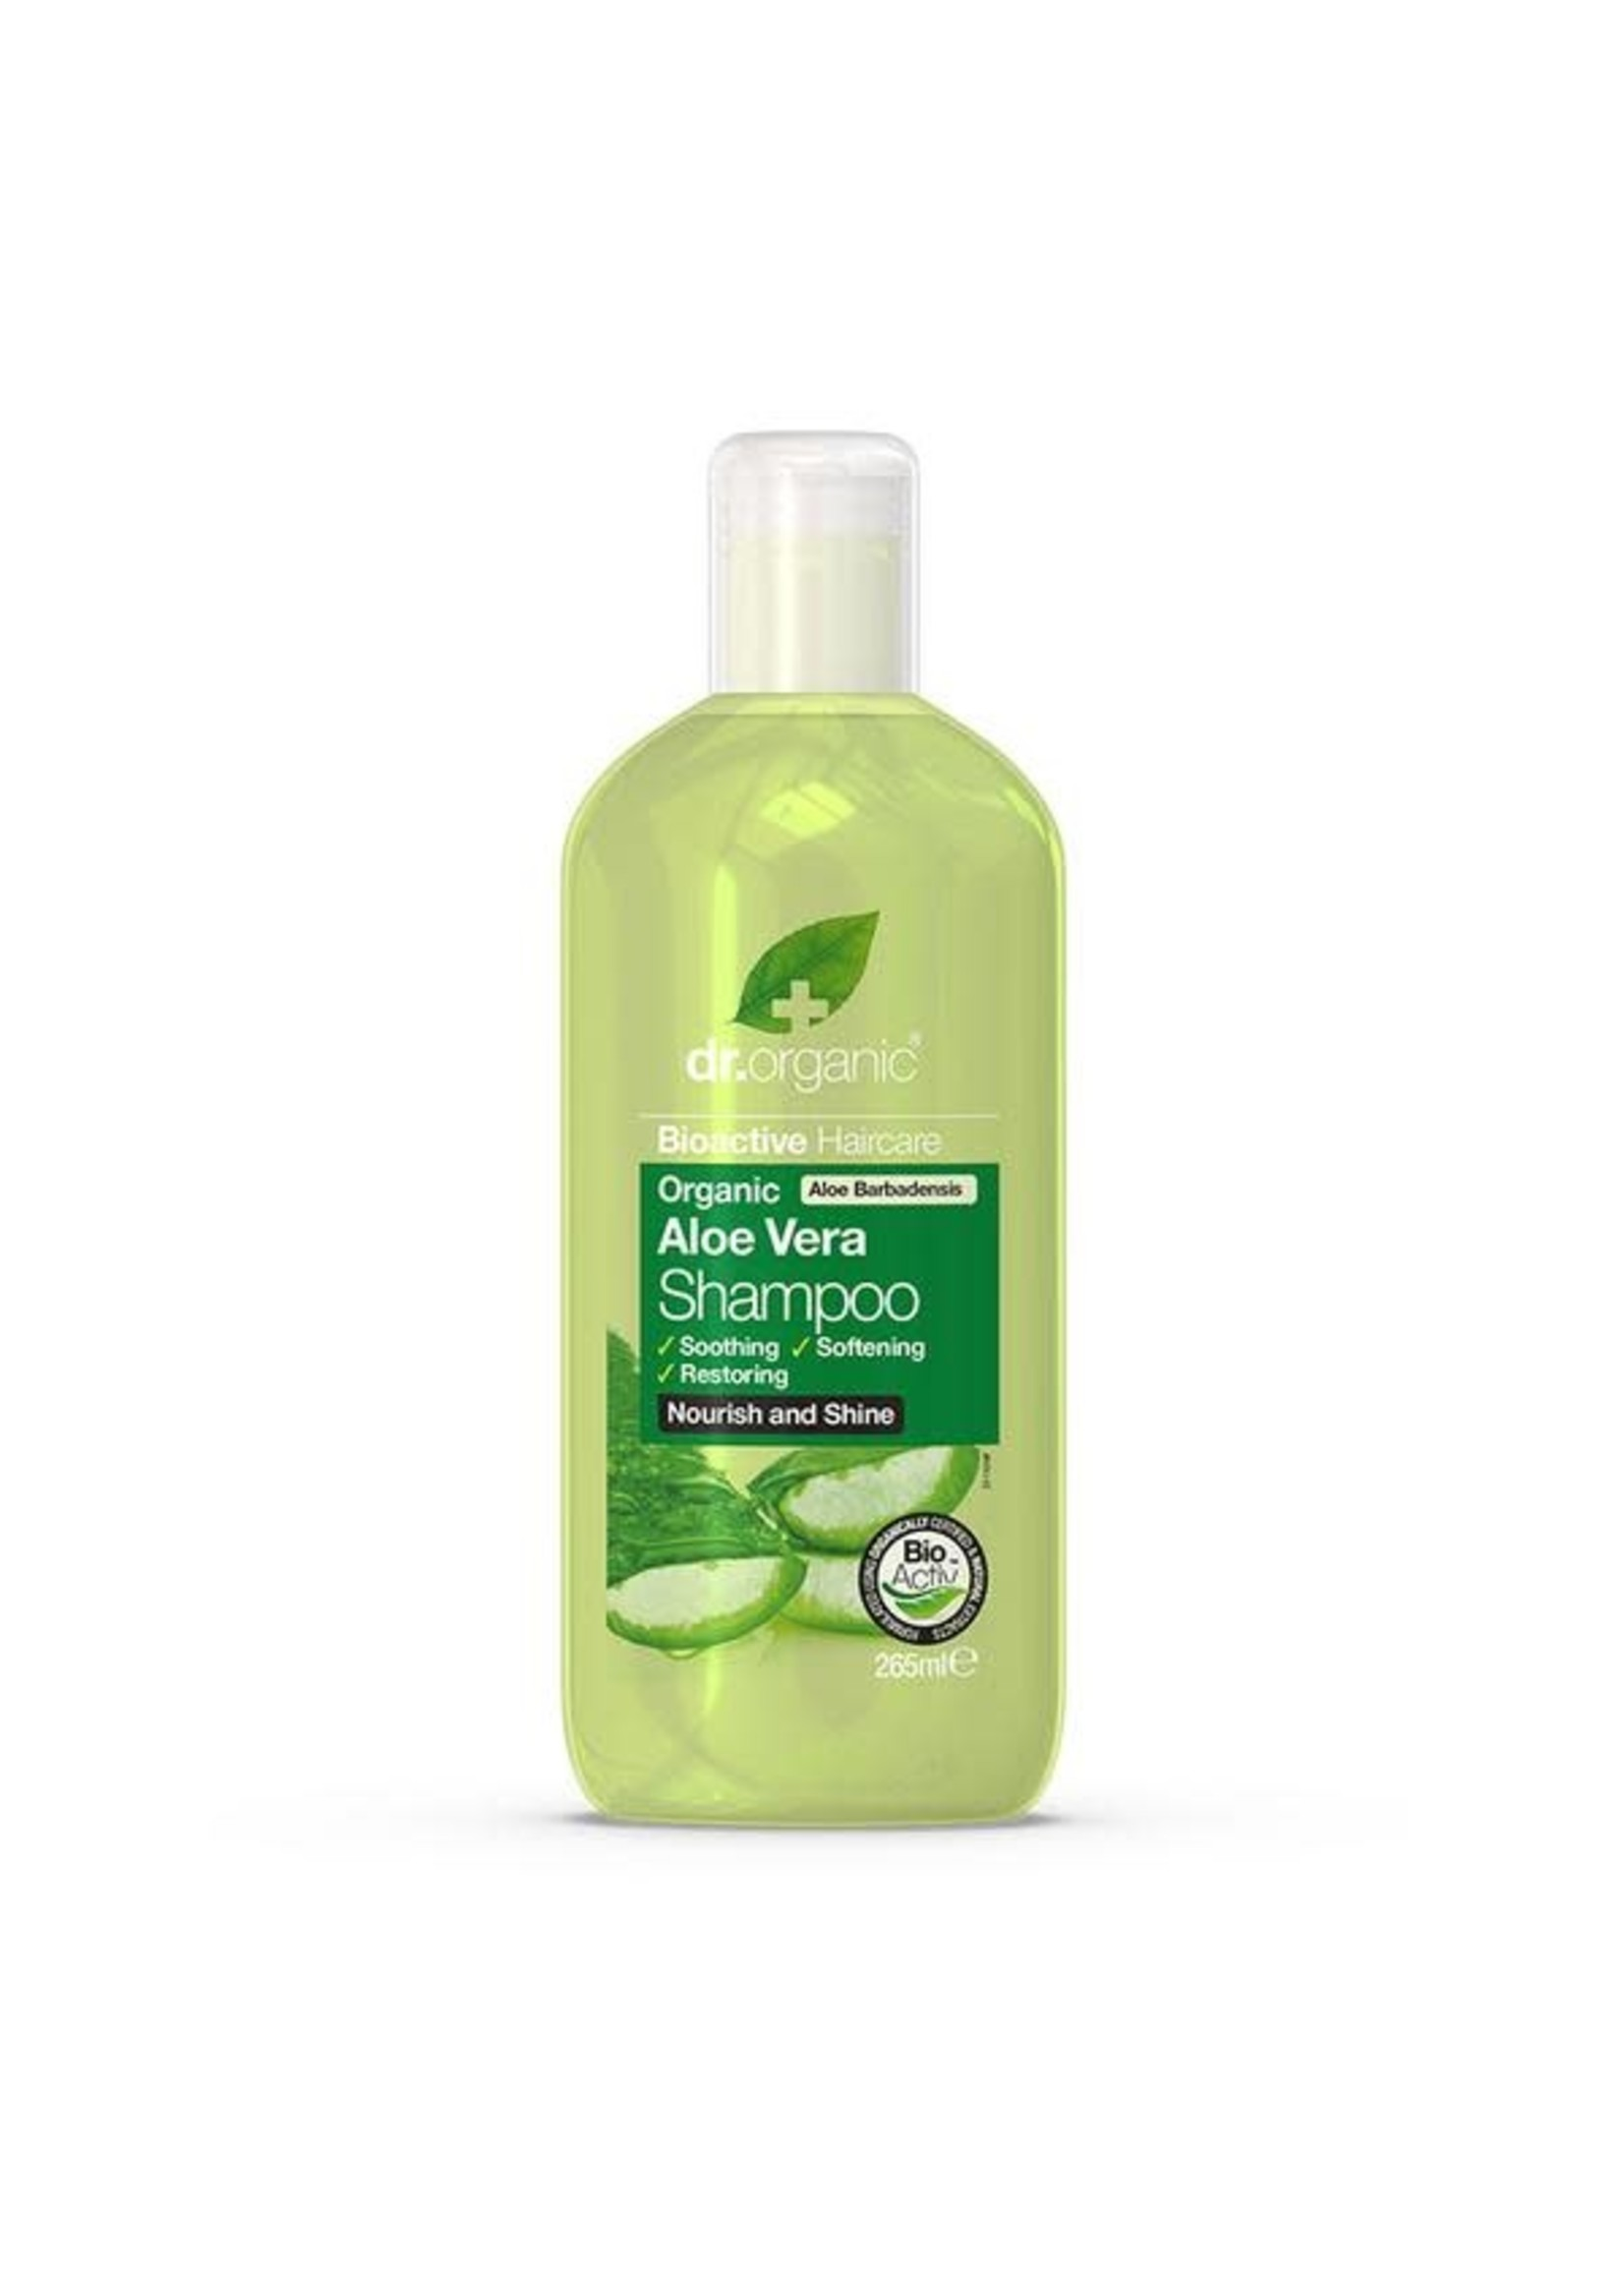 Dr Organic Dr Organic Shampoo Aloe Vera 265ml